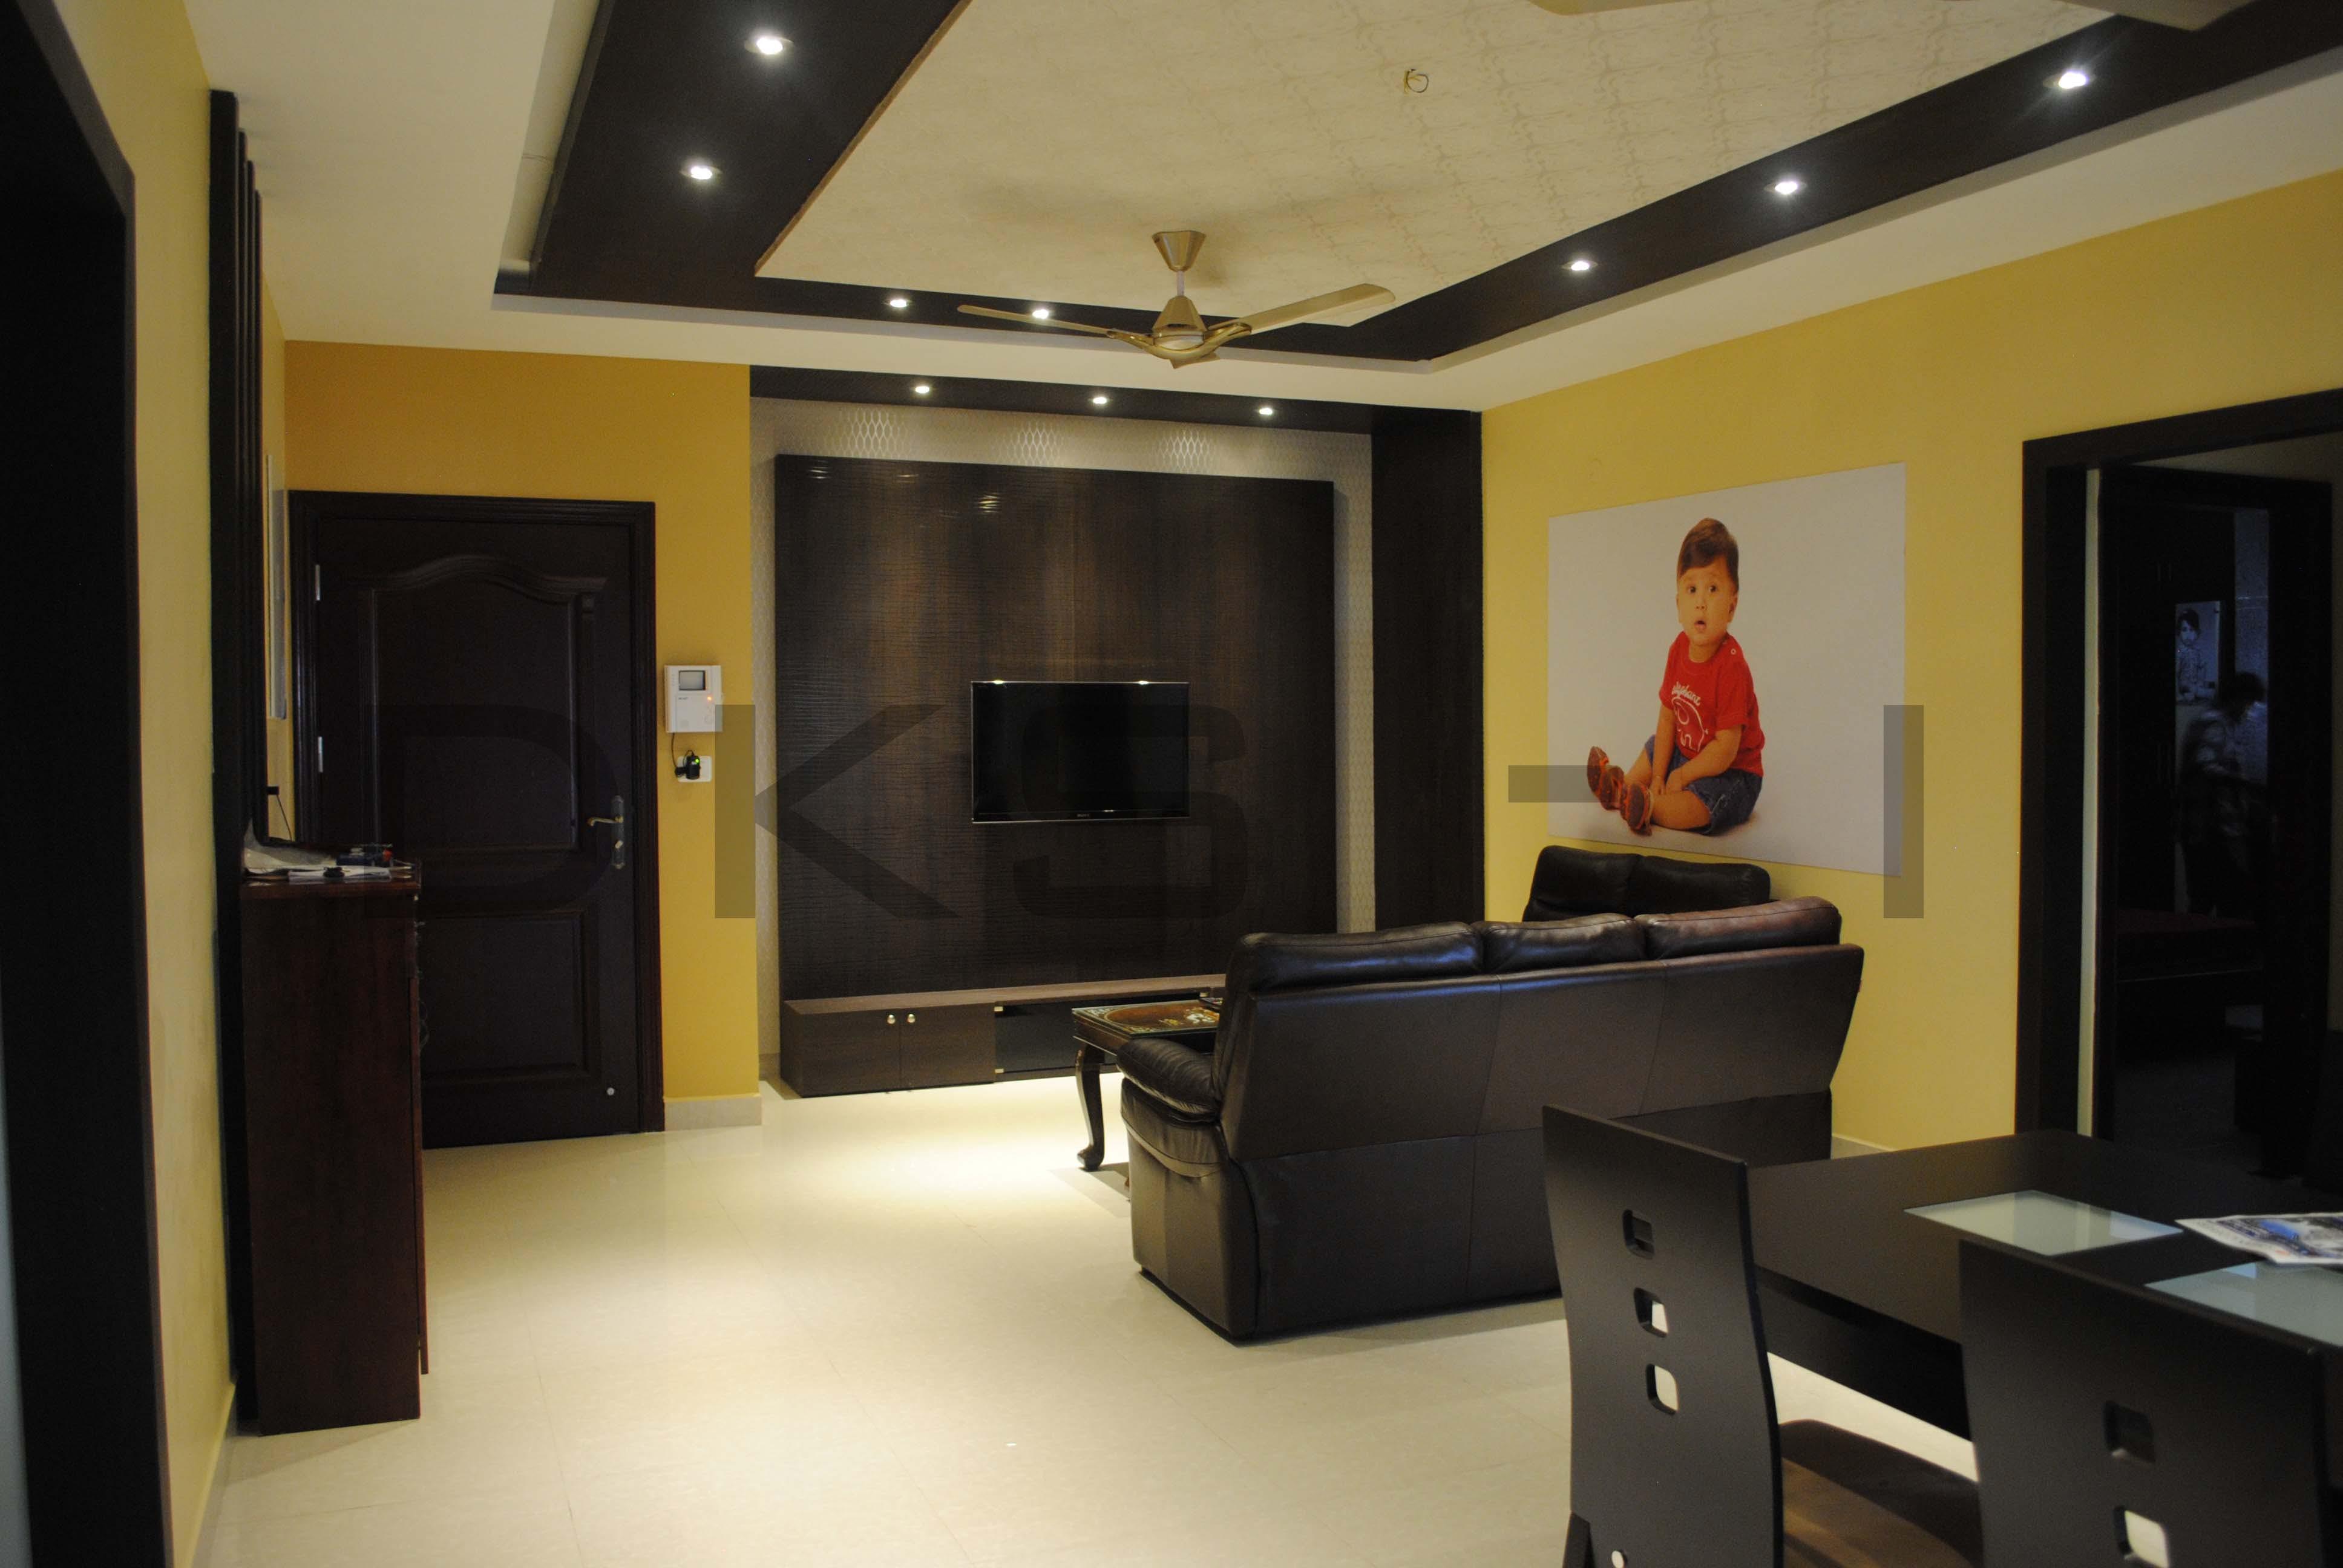 Living Room Interior Design Chennai residential interior design for mr.keerthivarman - bollineni